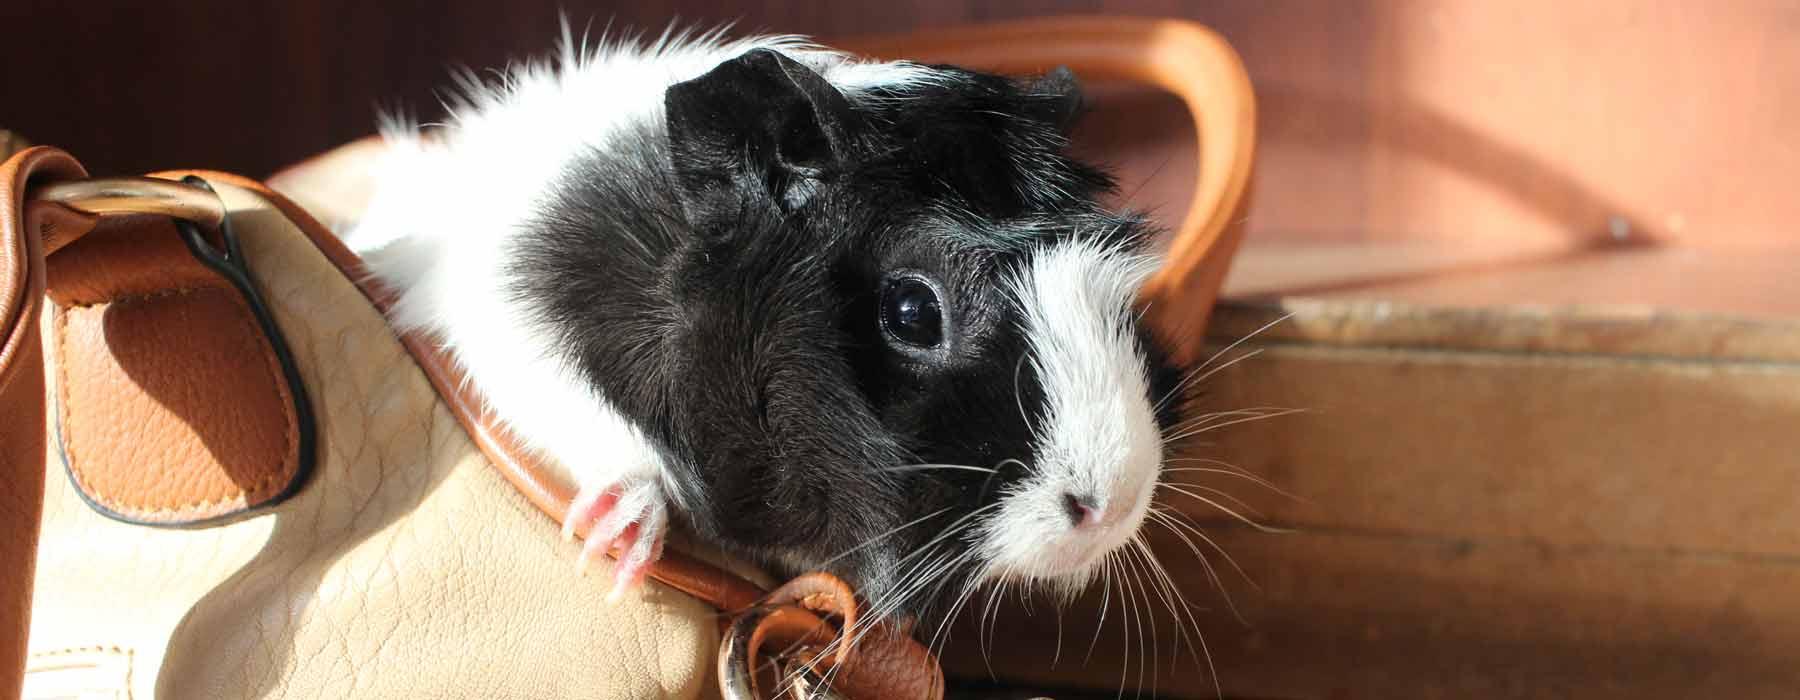 black and white guinea pig peeping out of a handbag